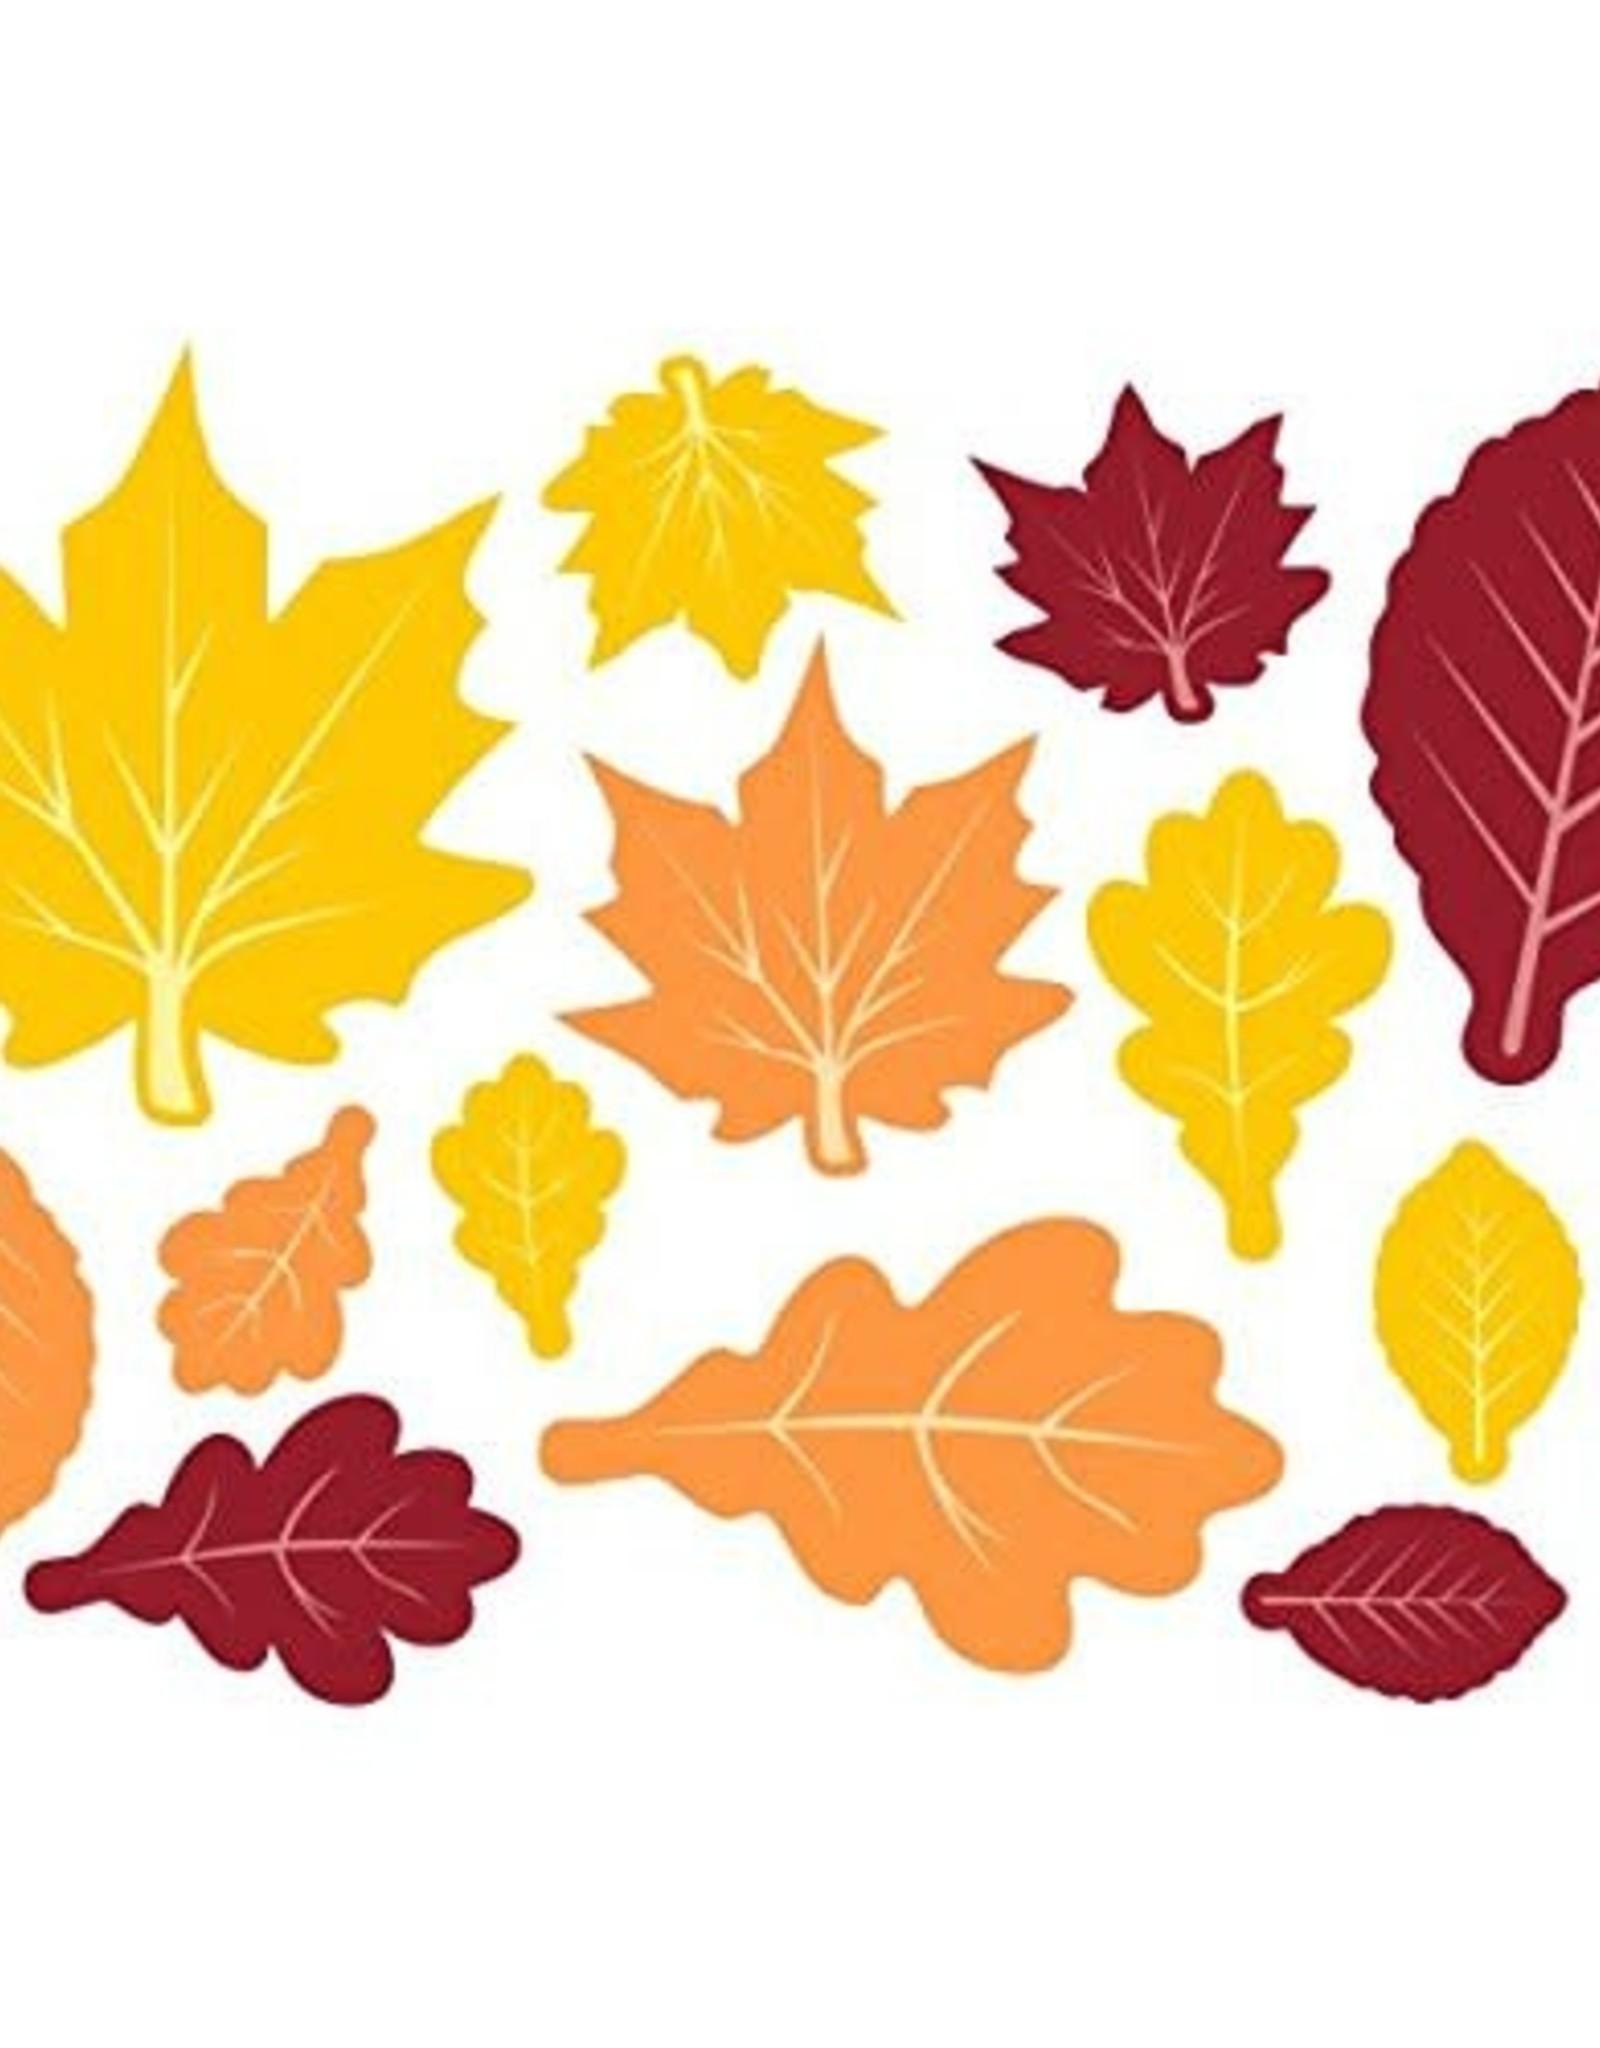 Cutouts Fall Leaves Decoration 30 pc